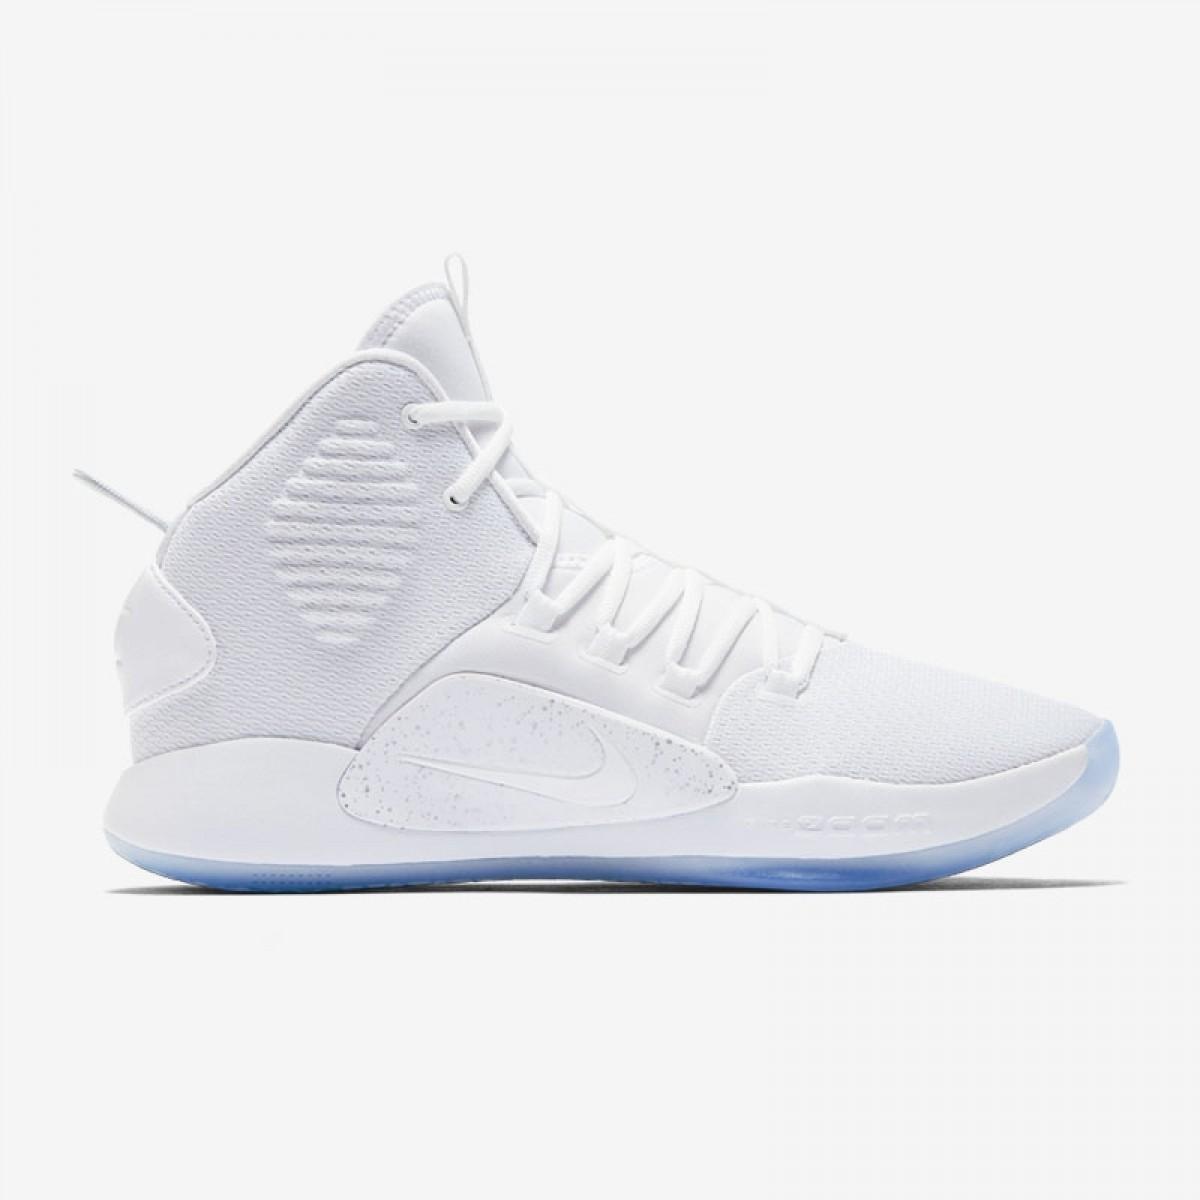 74673021c4 Buy Nike Hyperdunk X TB 2018 'White' Basketball shoes & sneakers